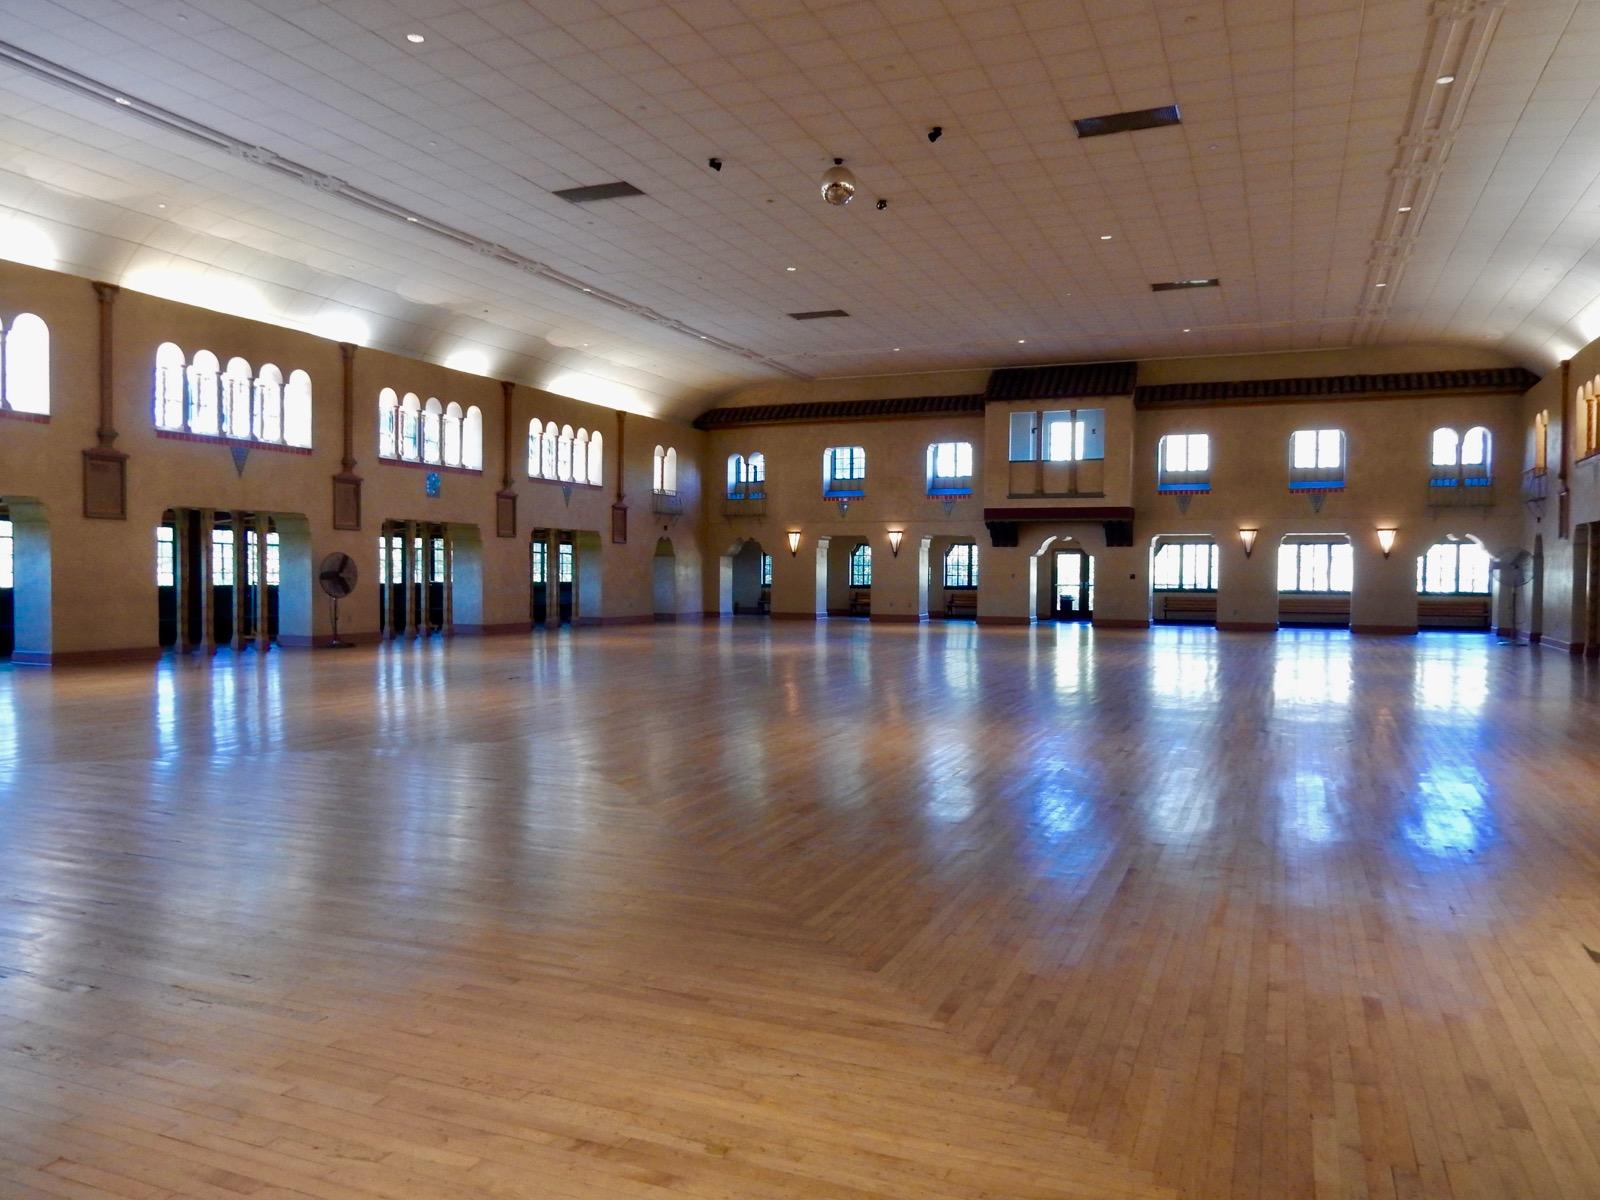 Crash Course in Ballroom Dancing - Learn Ballroom Dancing ...